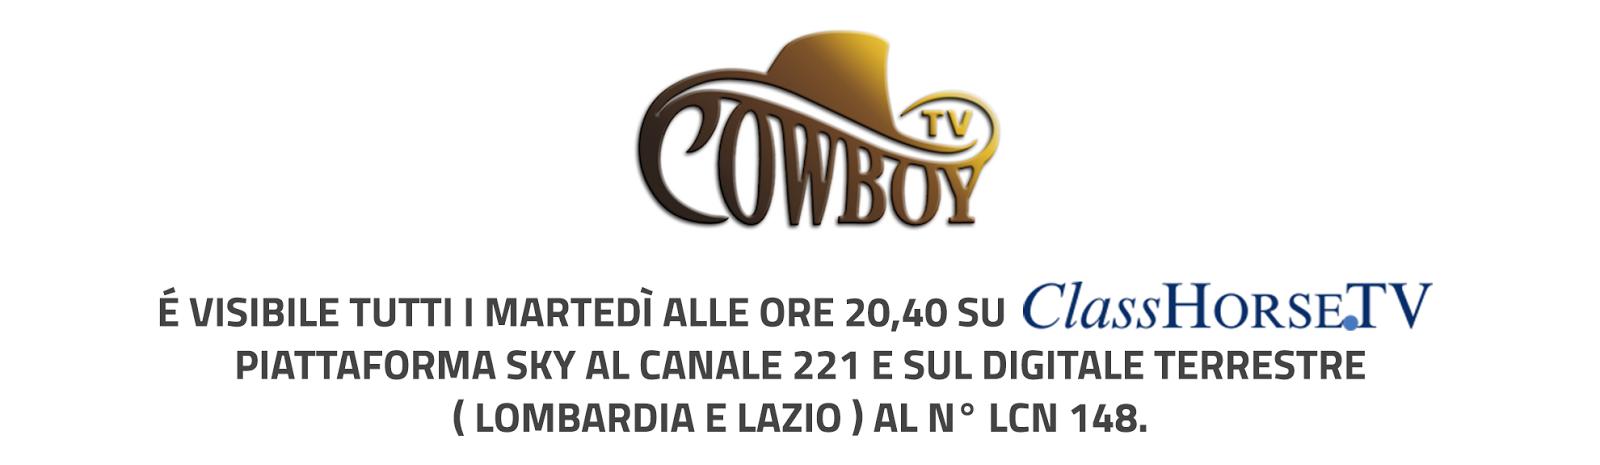 COWBOY TV